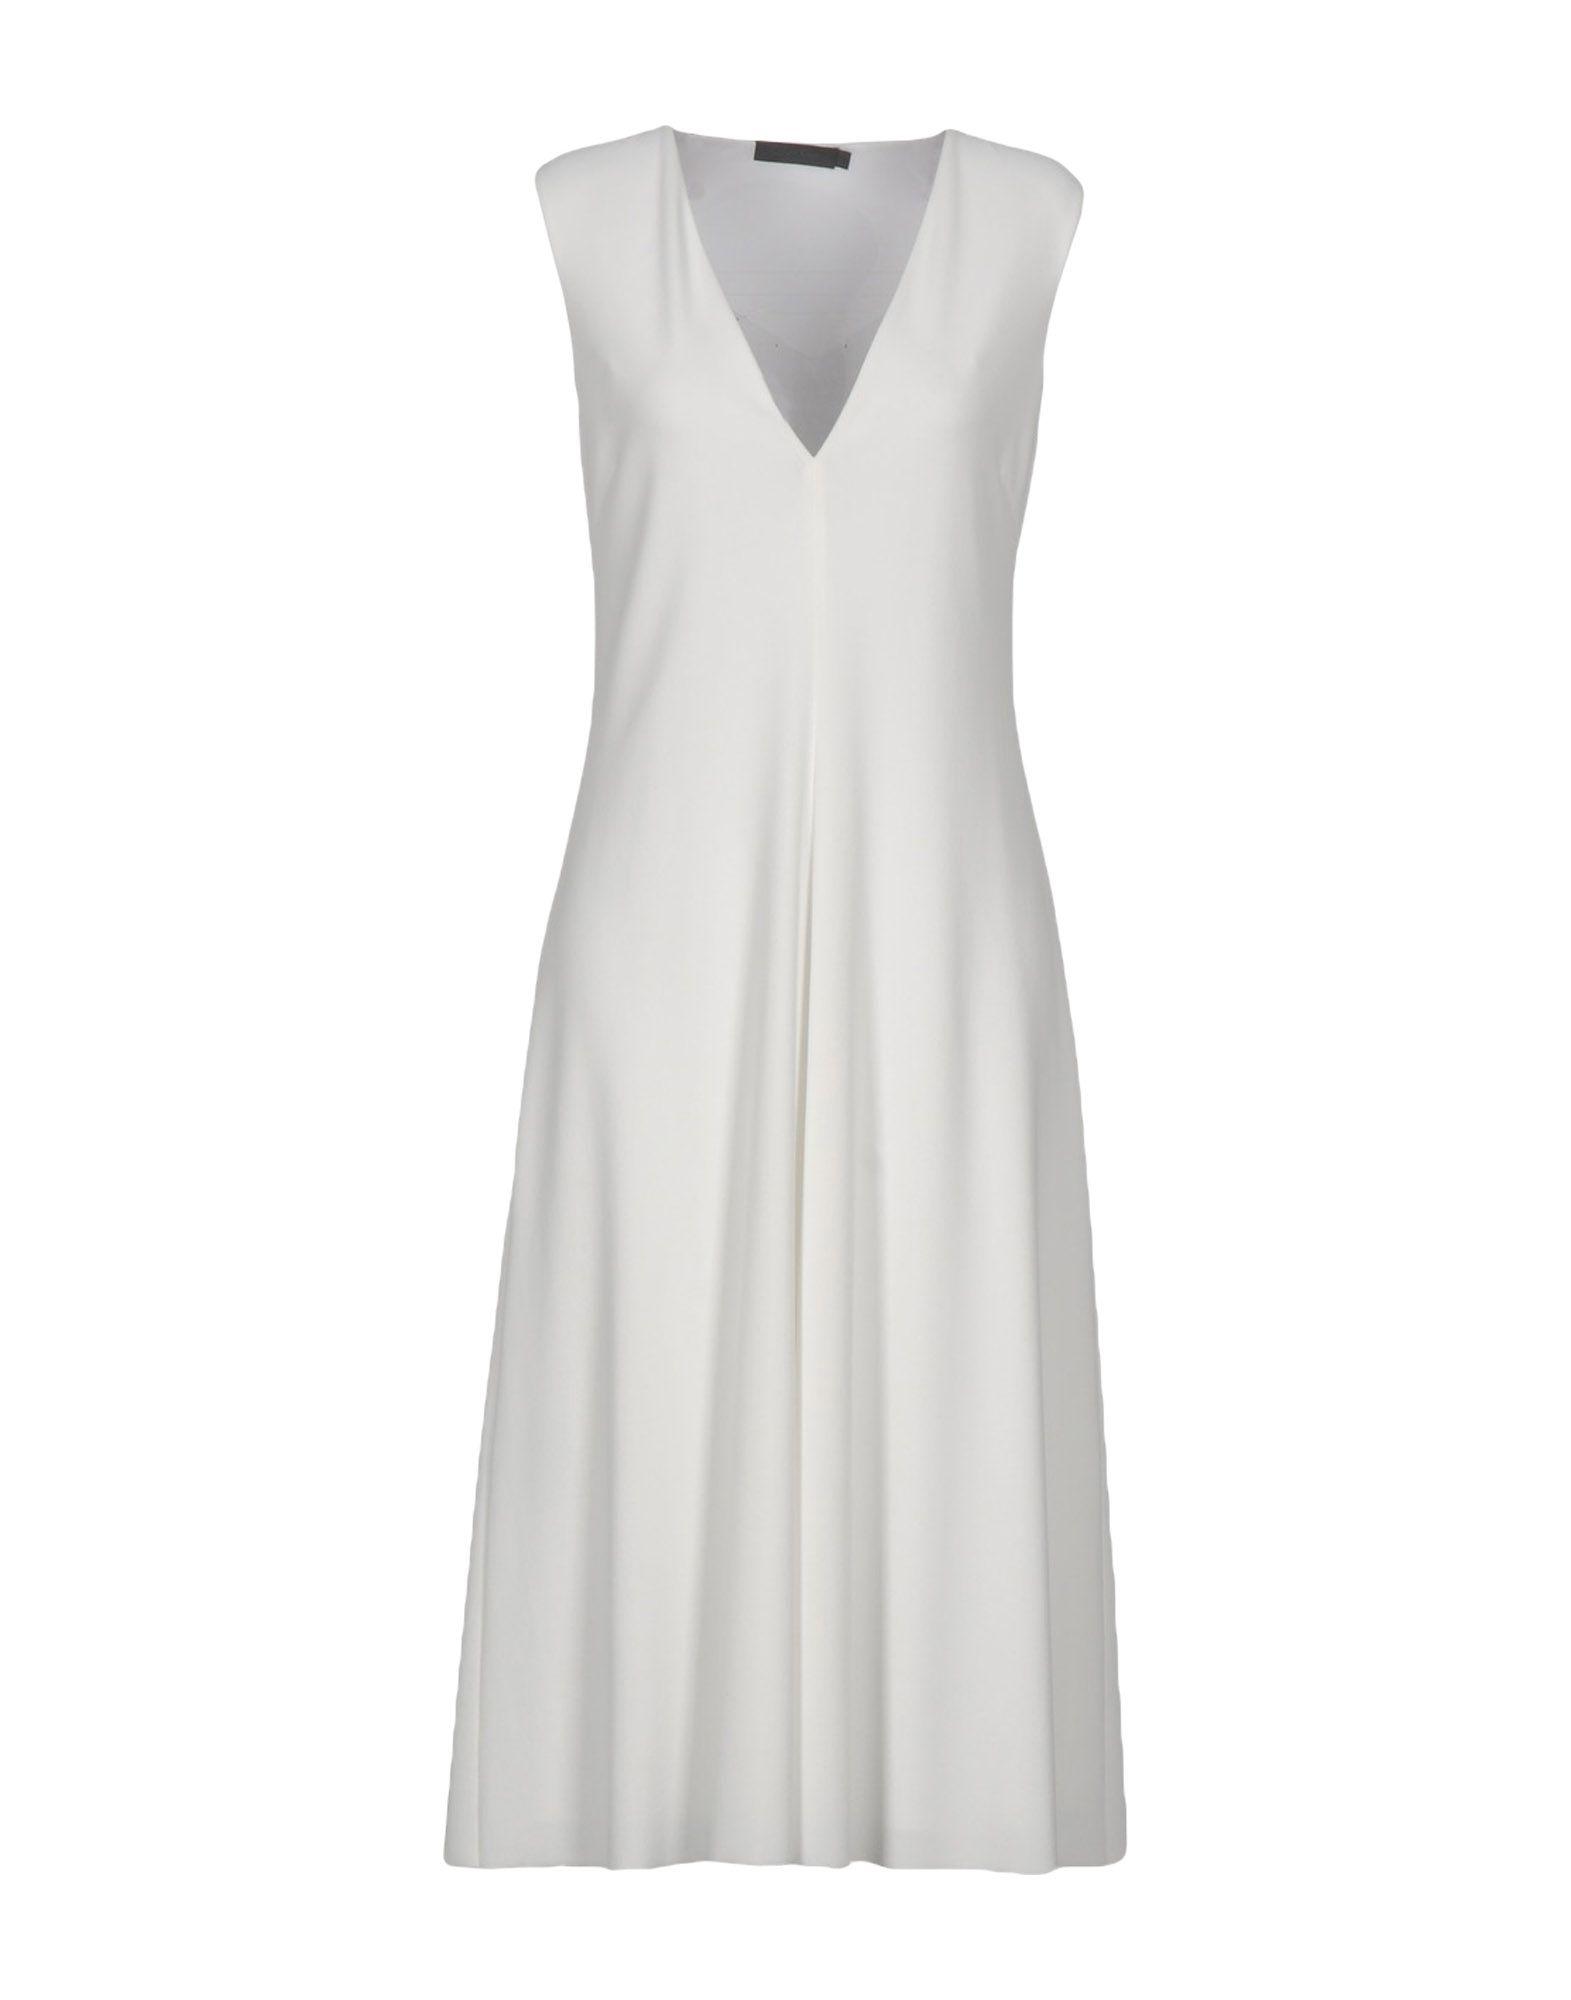 CALVIN KLEIN COLLECTION Платье до колена